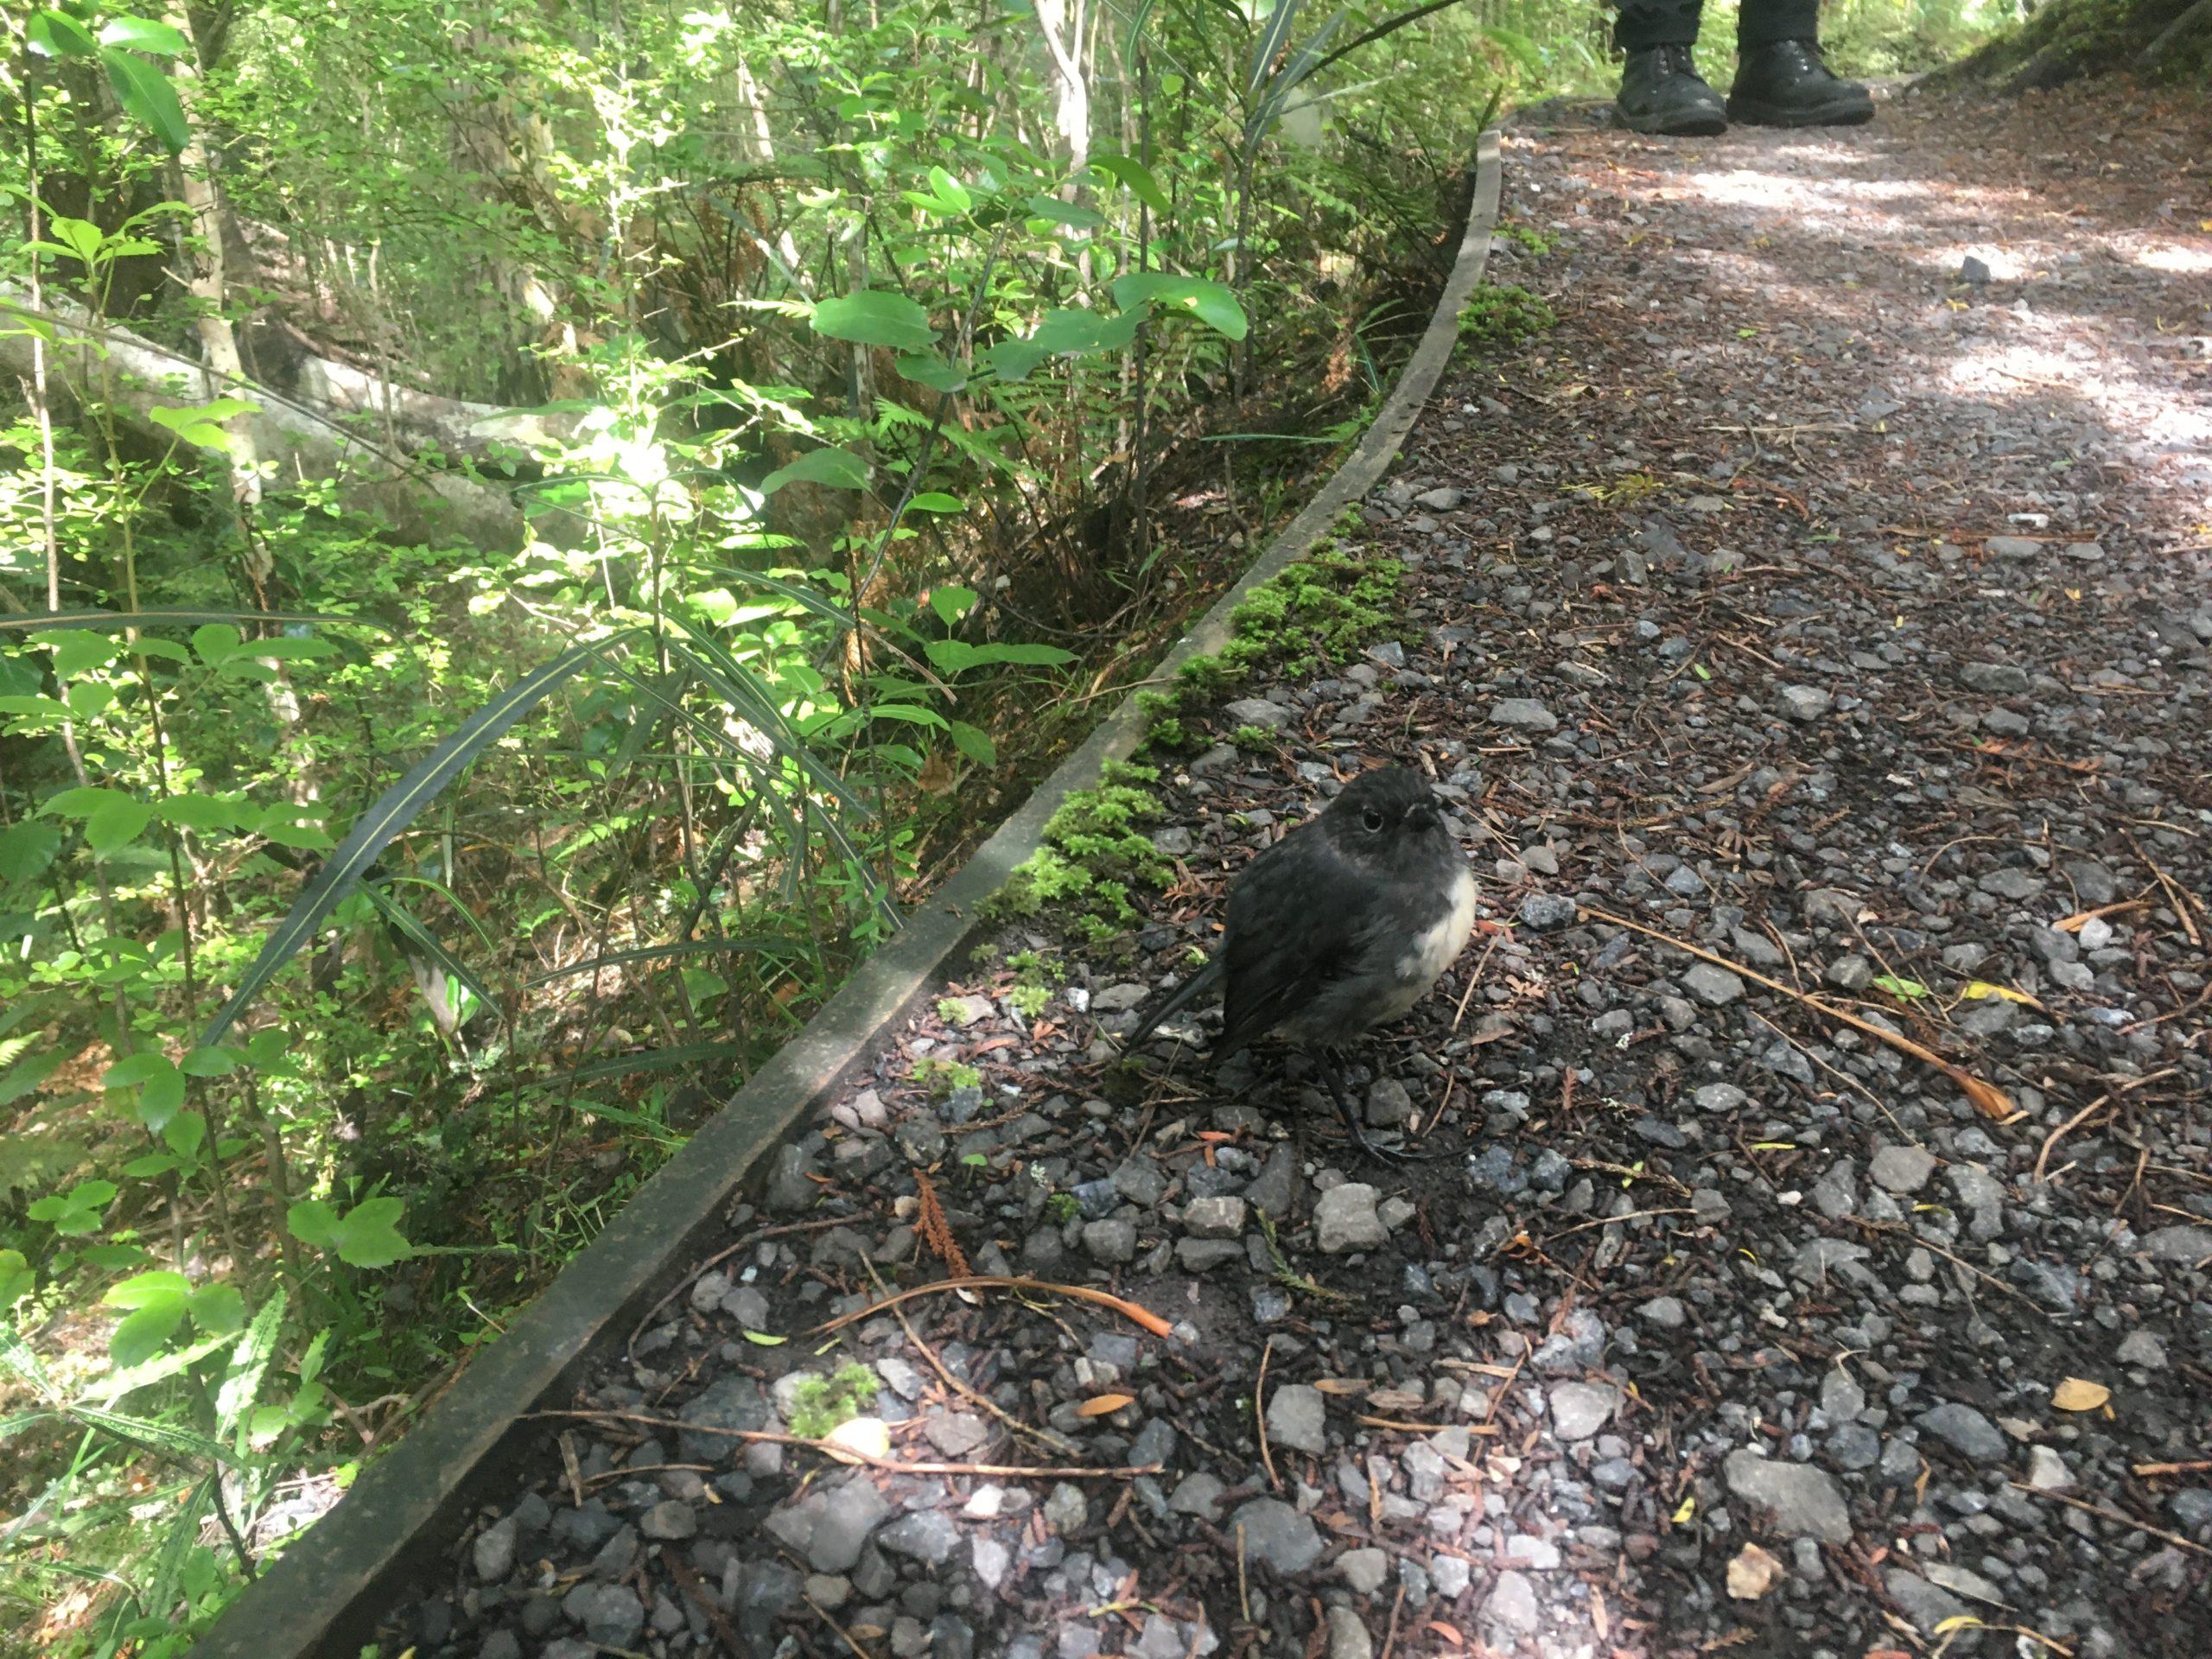 Toutouwai - Stewart Island Robin - so inquisitive